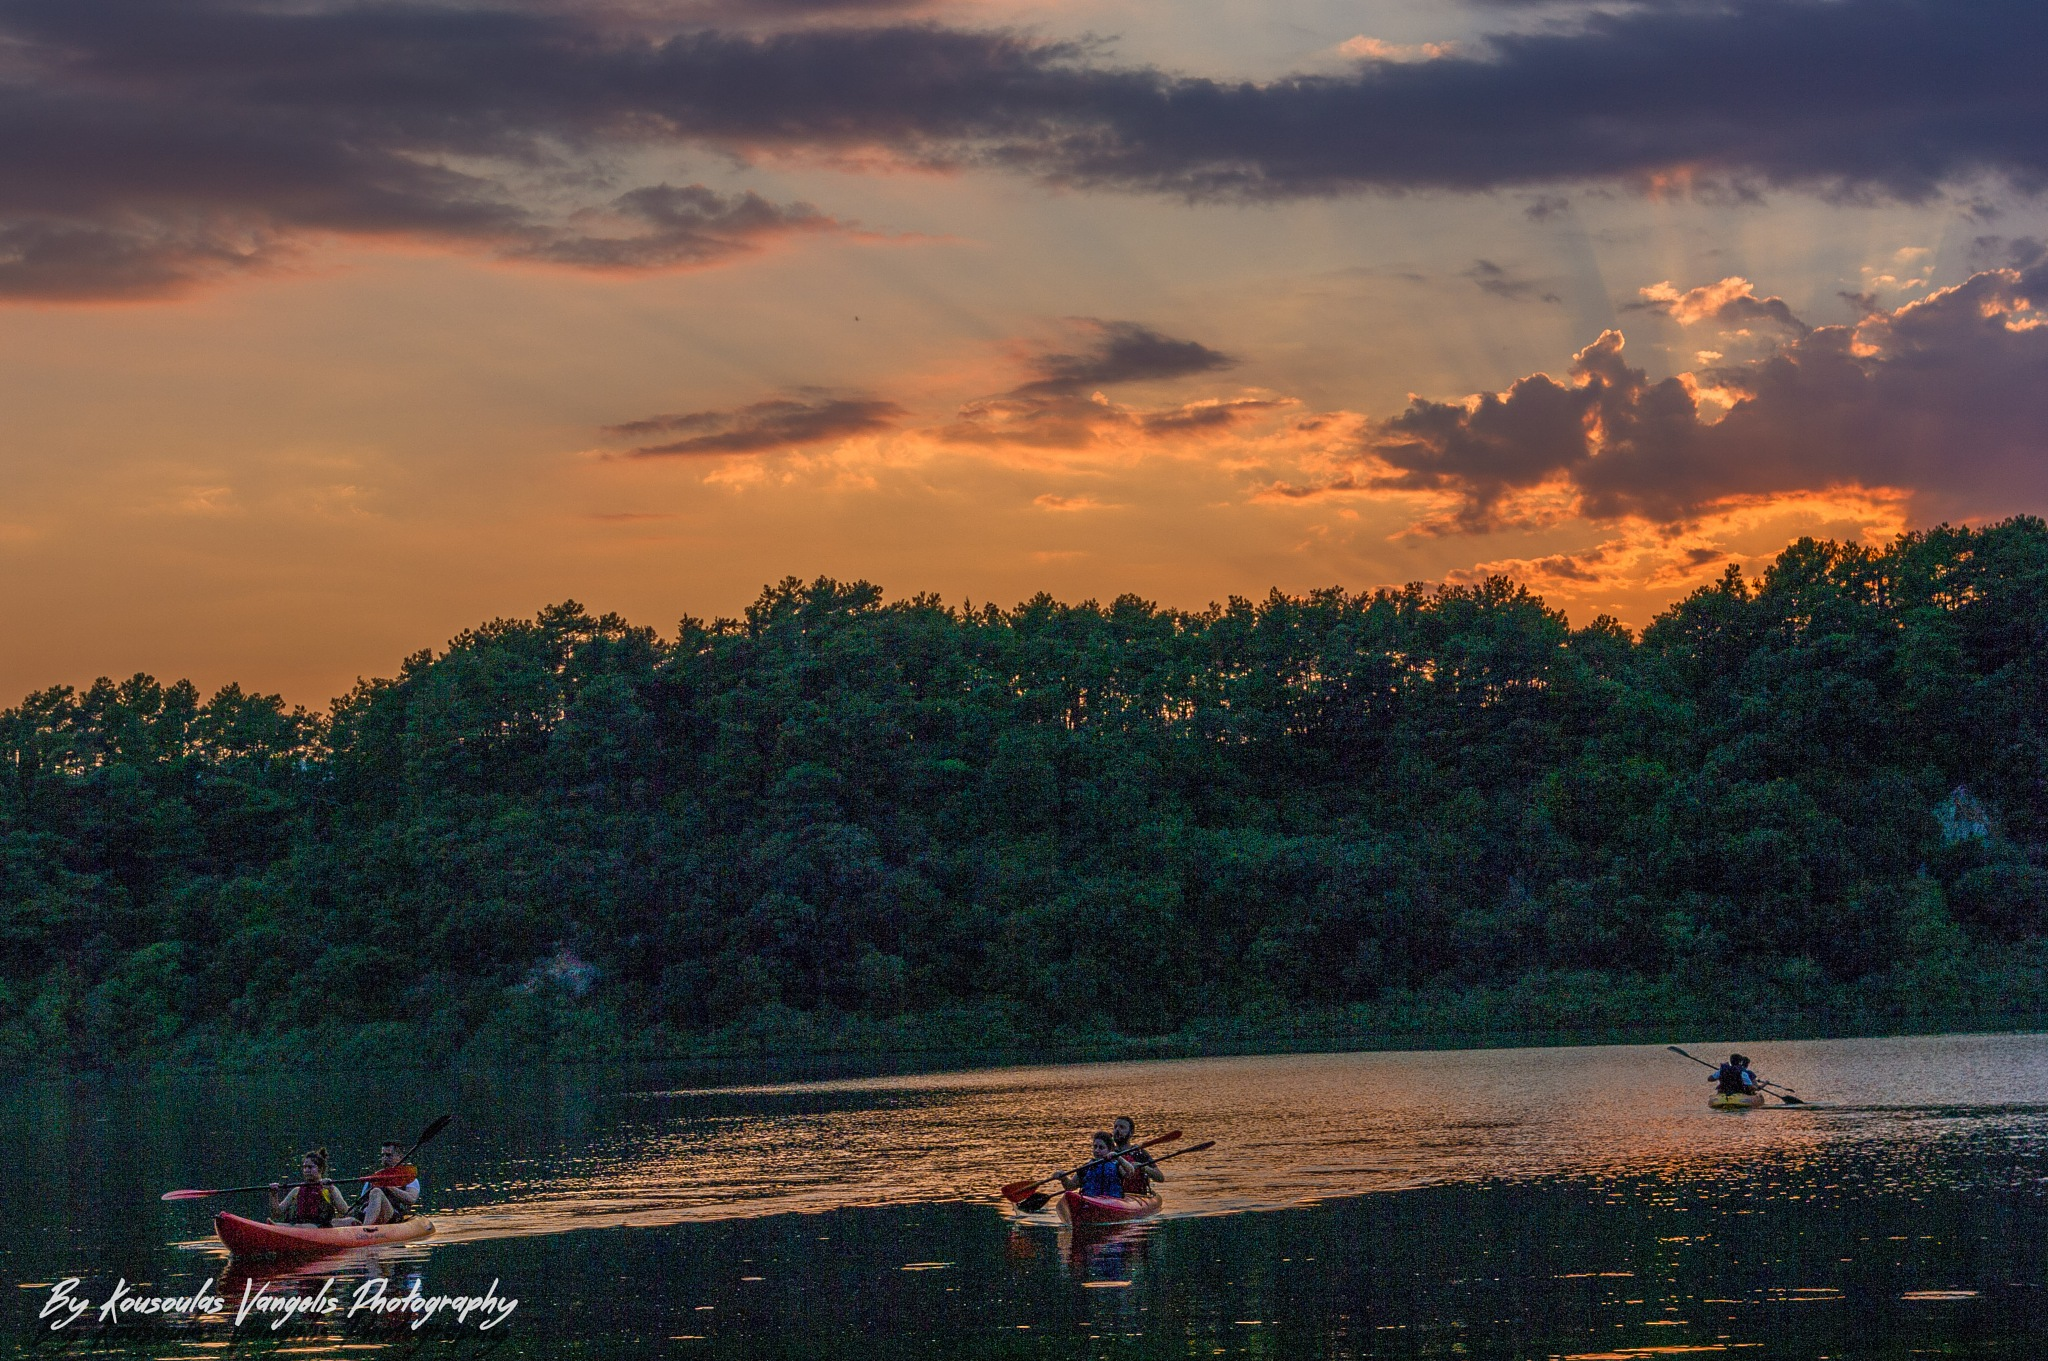 Lake Ziros sunset by kousoulas vangelis